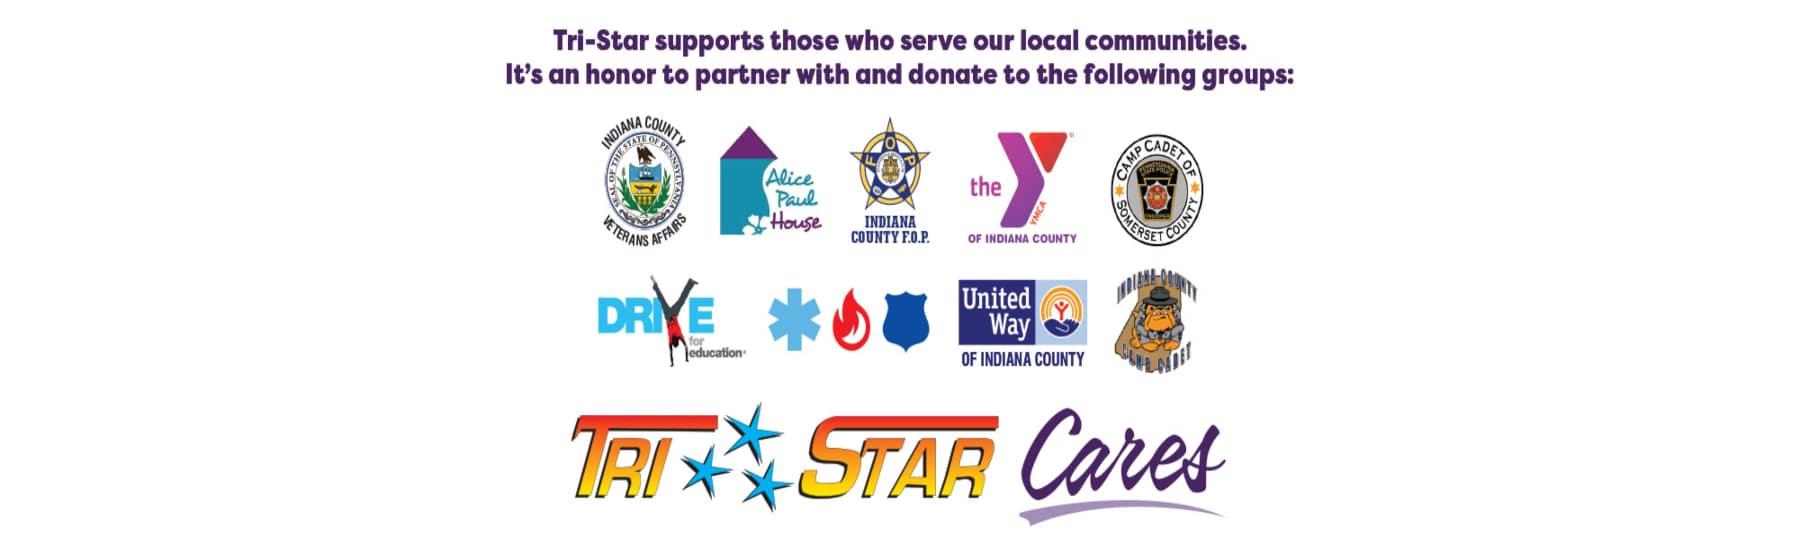 Tri-Star Nissan Charity Work